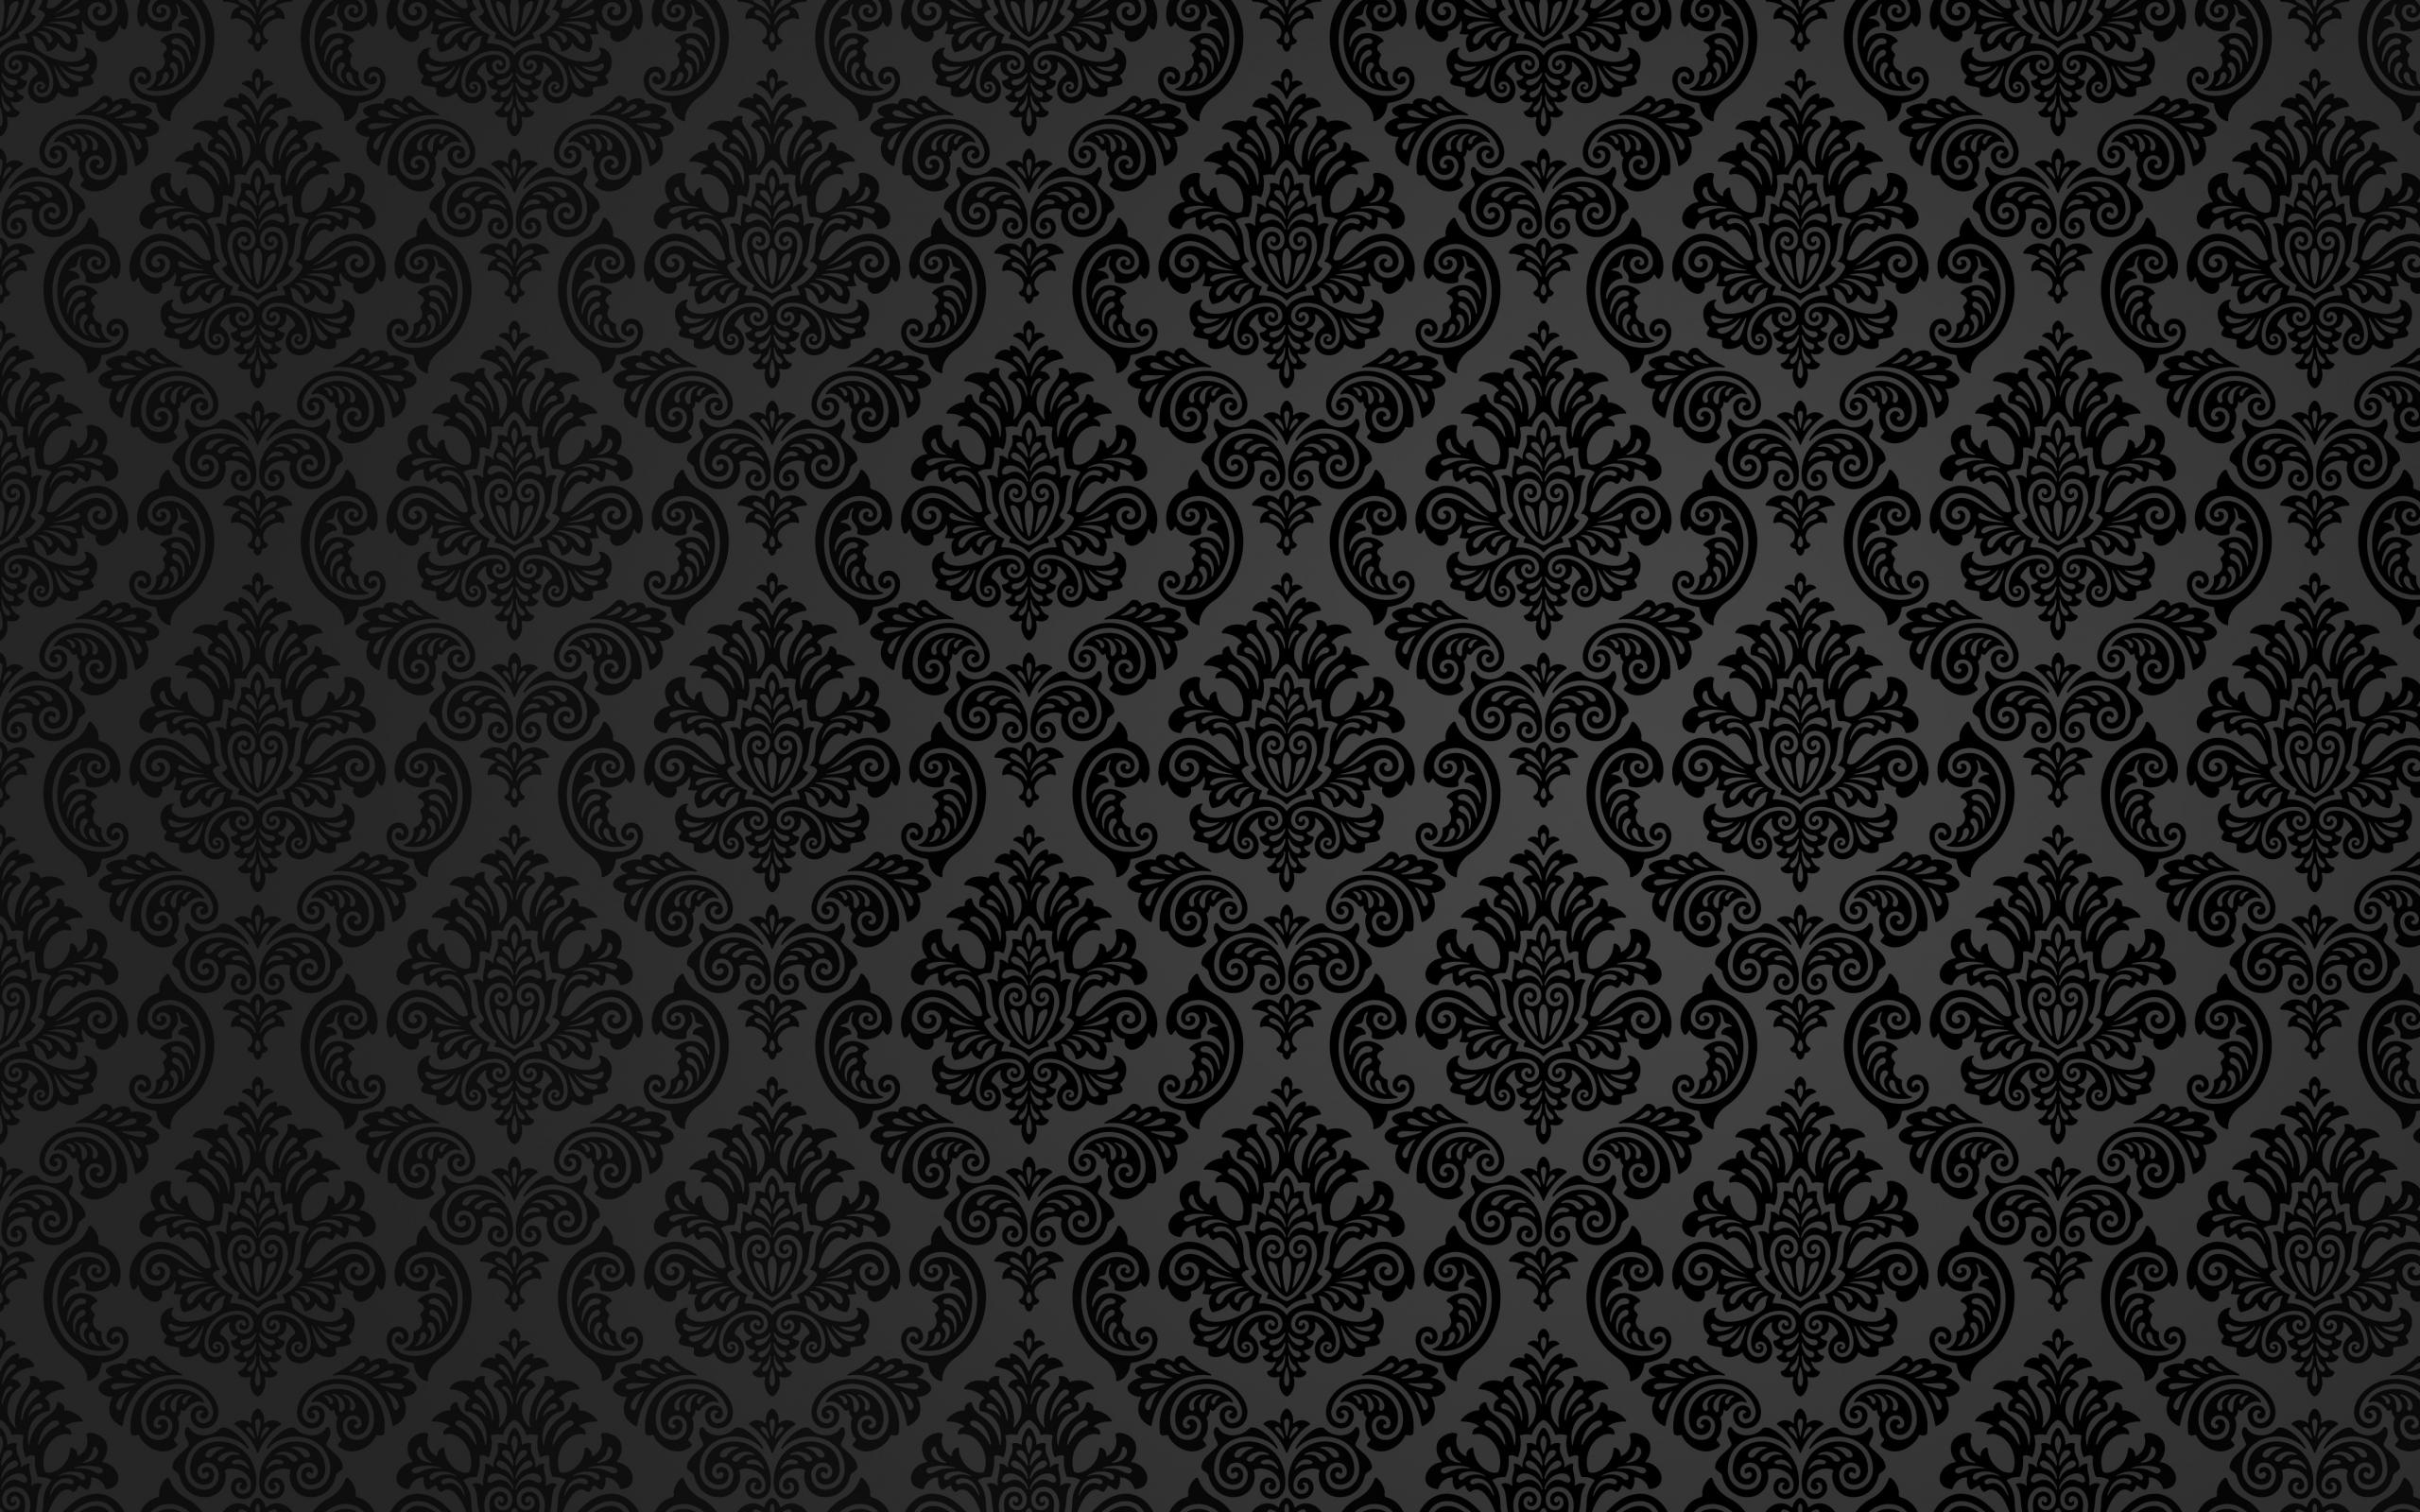 48 pattern background wallpaper on